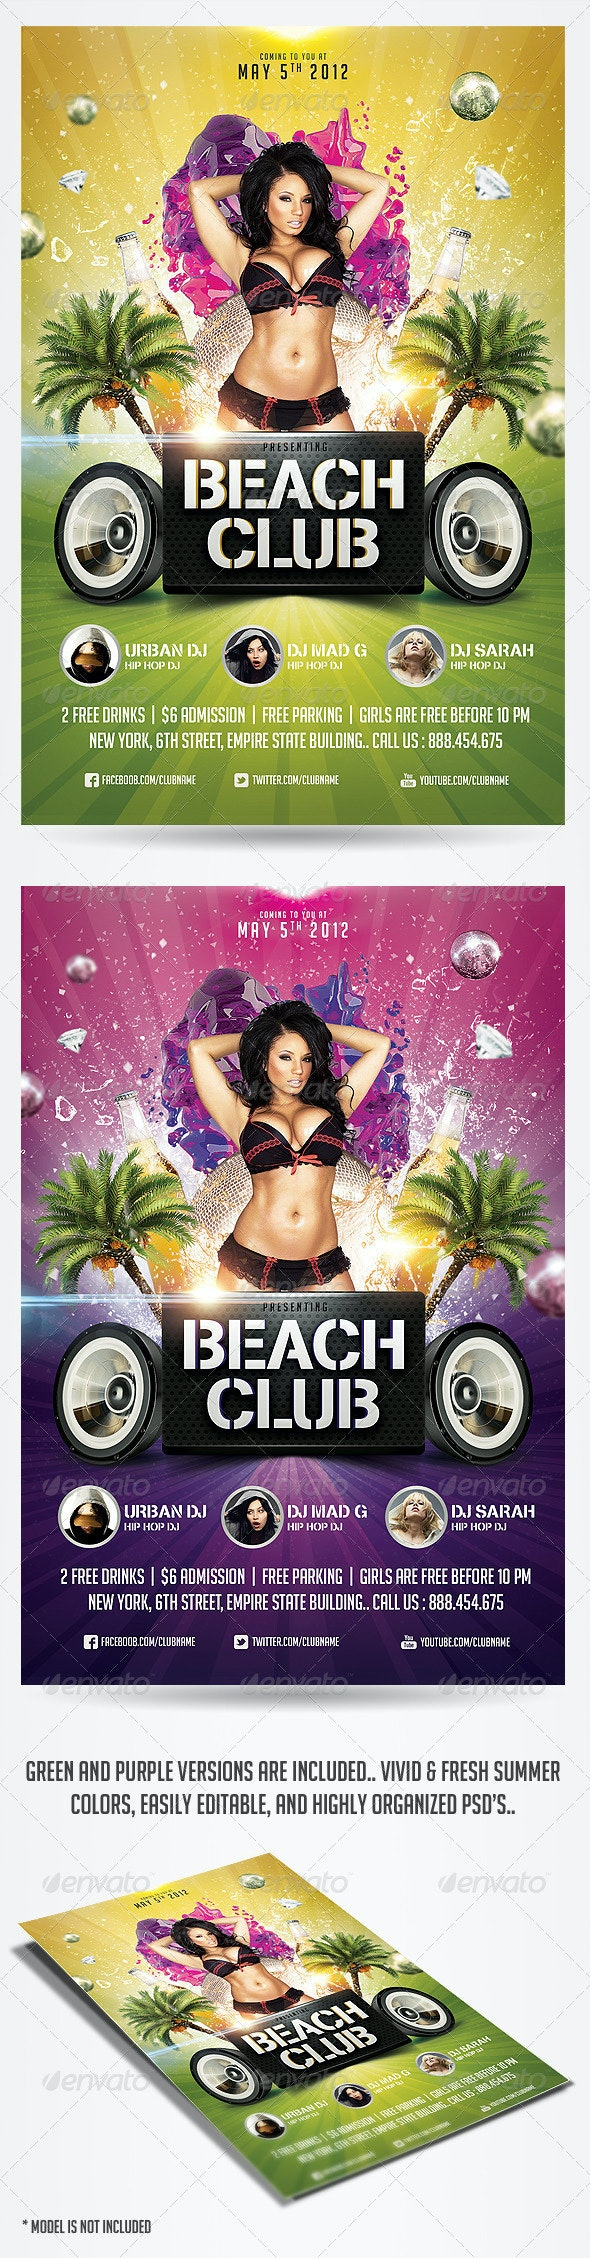 Summer Beach Club Flyer Template - Clubs & Parties Events